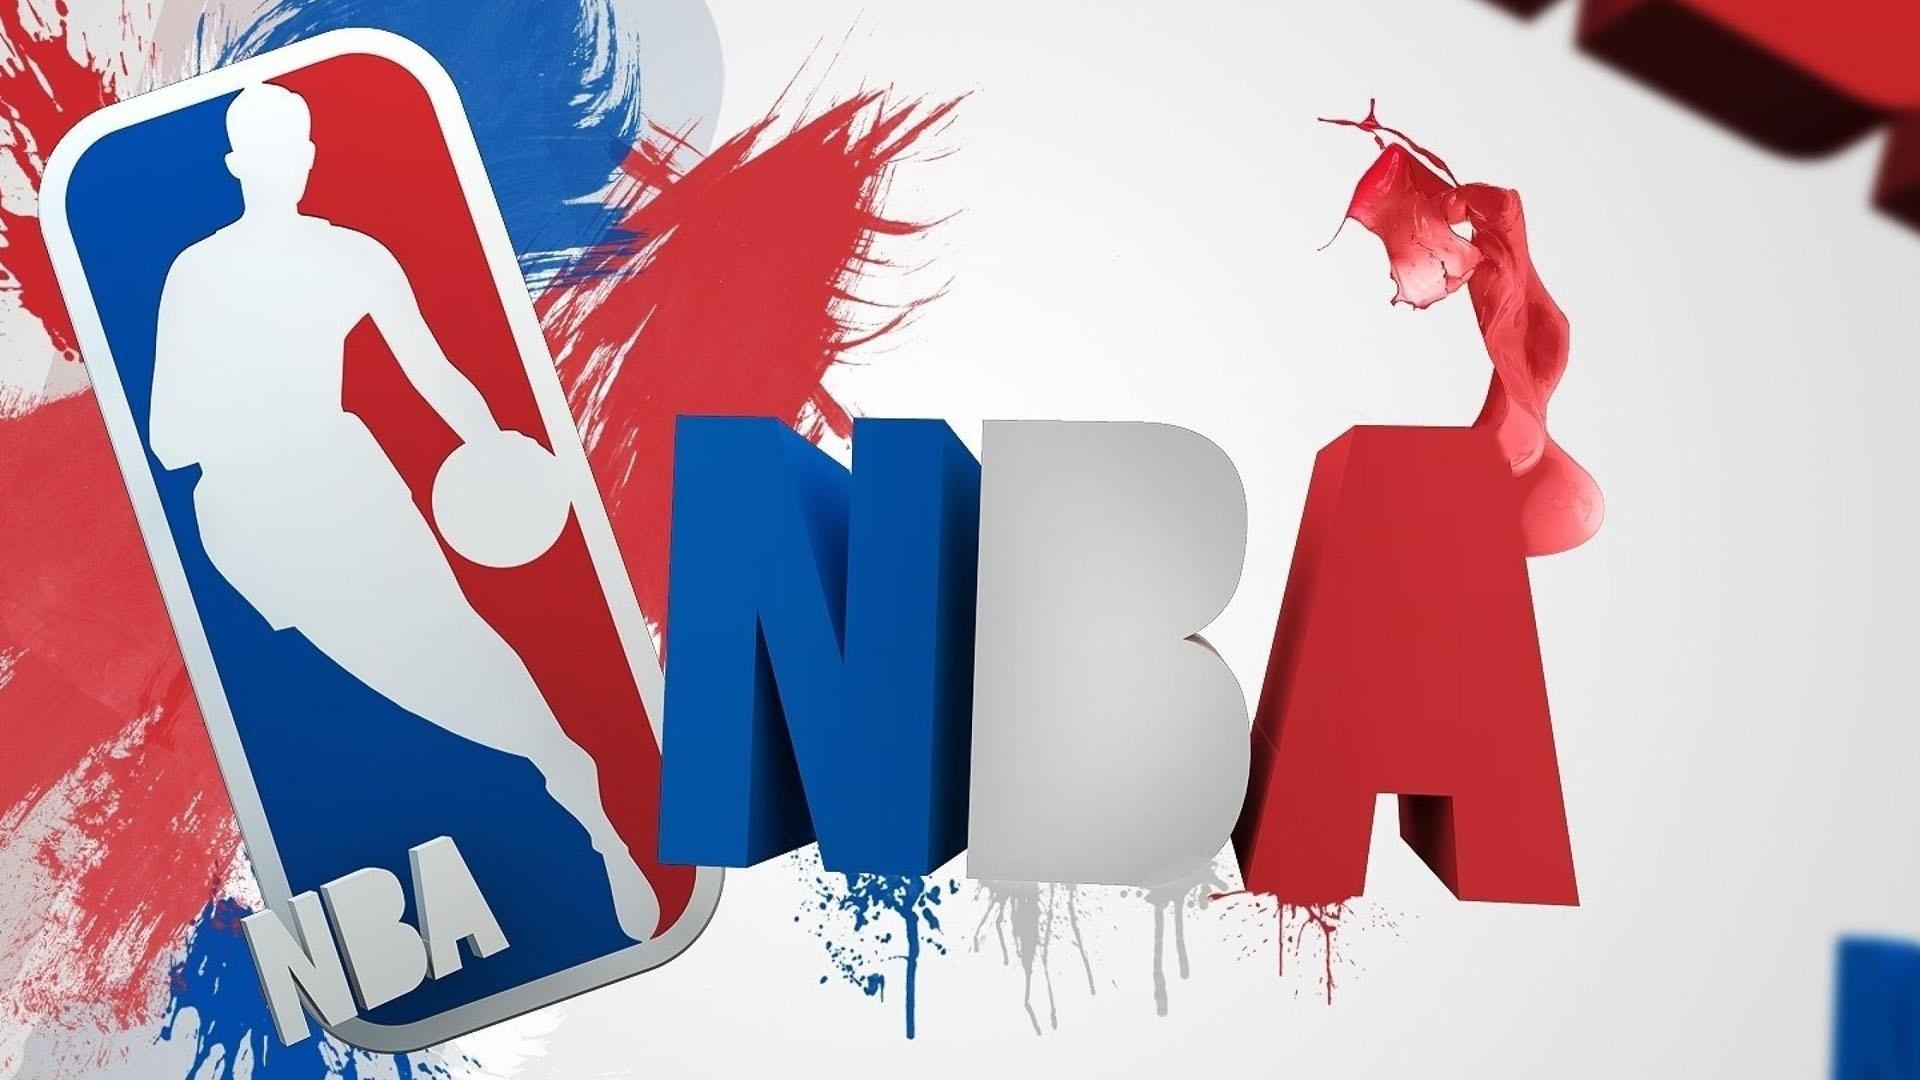 Nba Basketball Logo Wallpaper Hd Desktop 3256 1023 Wallpaper   HD .